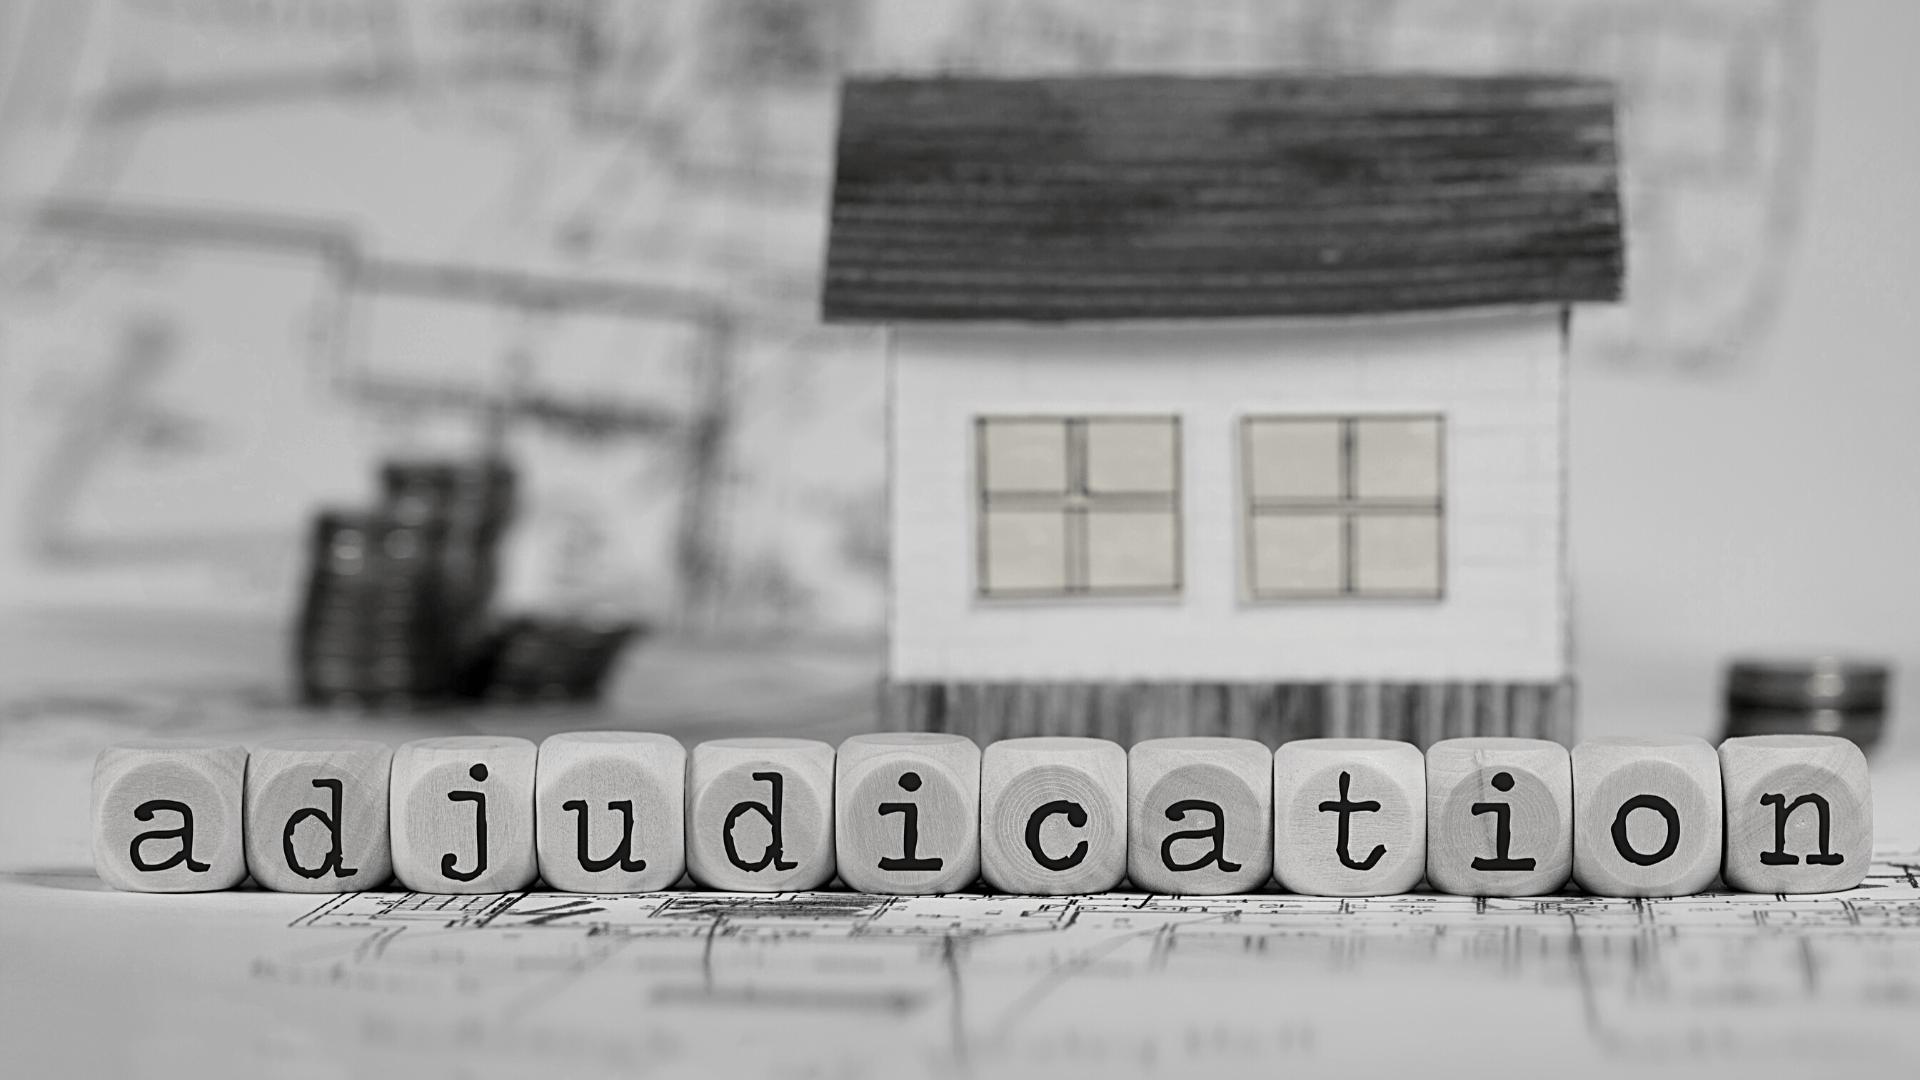 building and construction adjudication